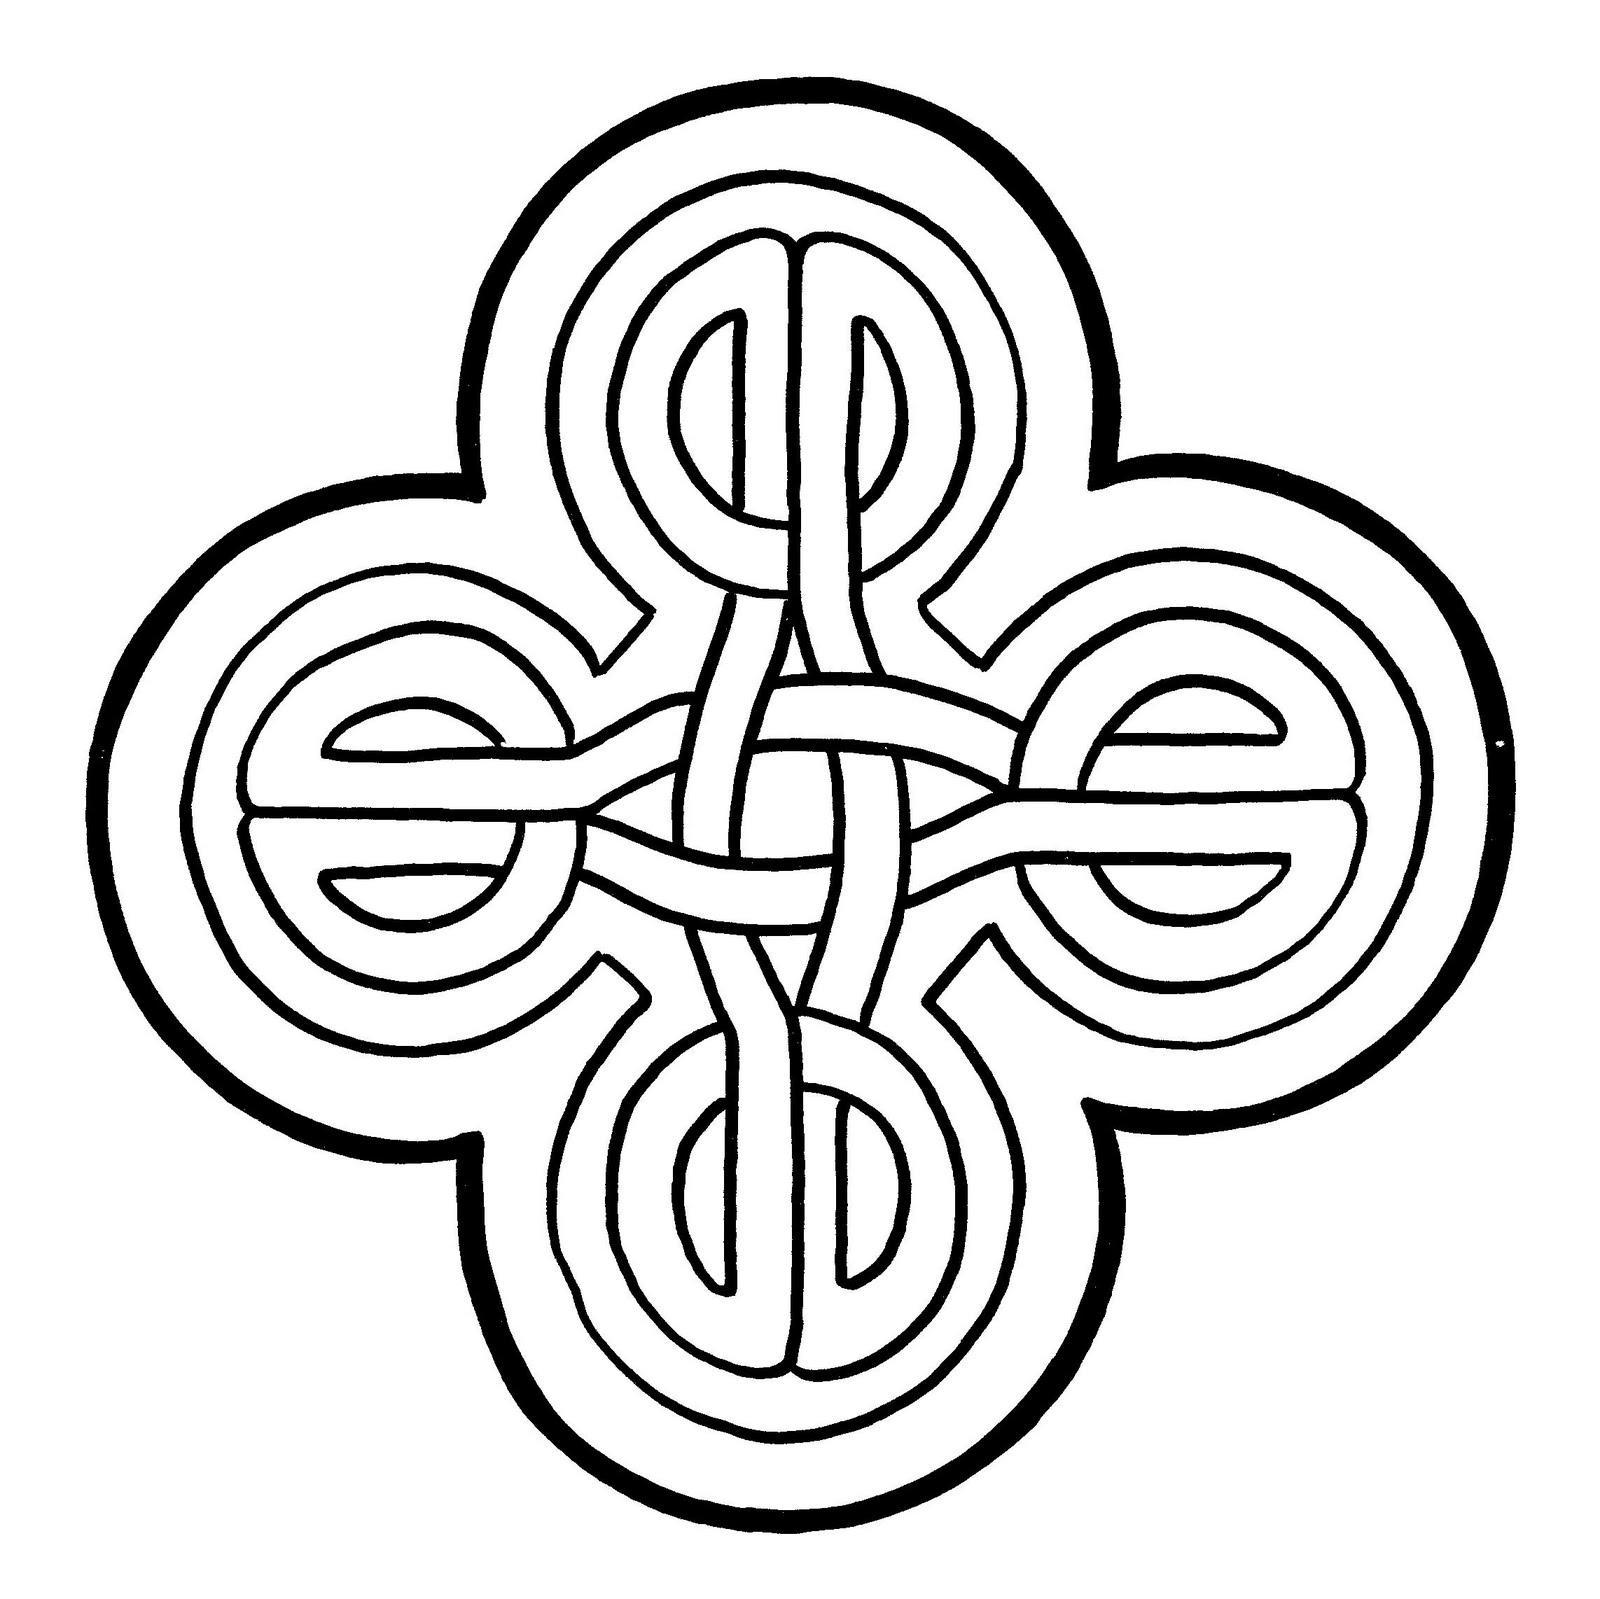 Mandalas Para Pintar: Cuatro nudos celtas entrelazados